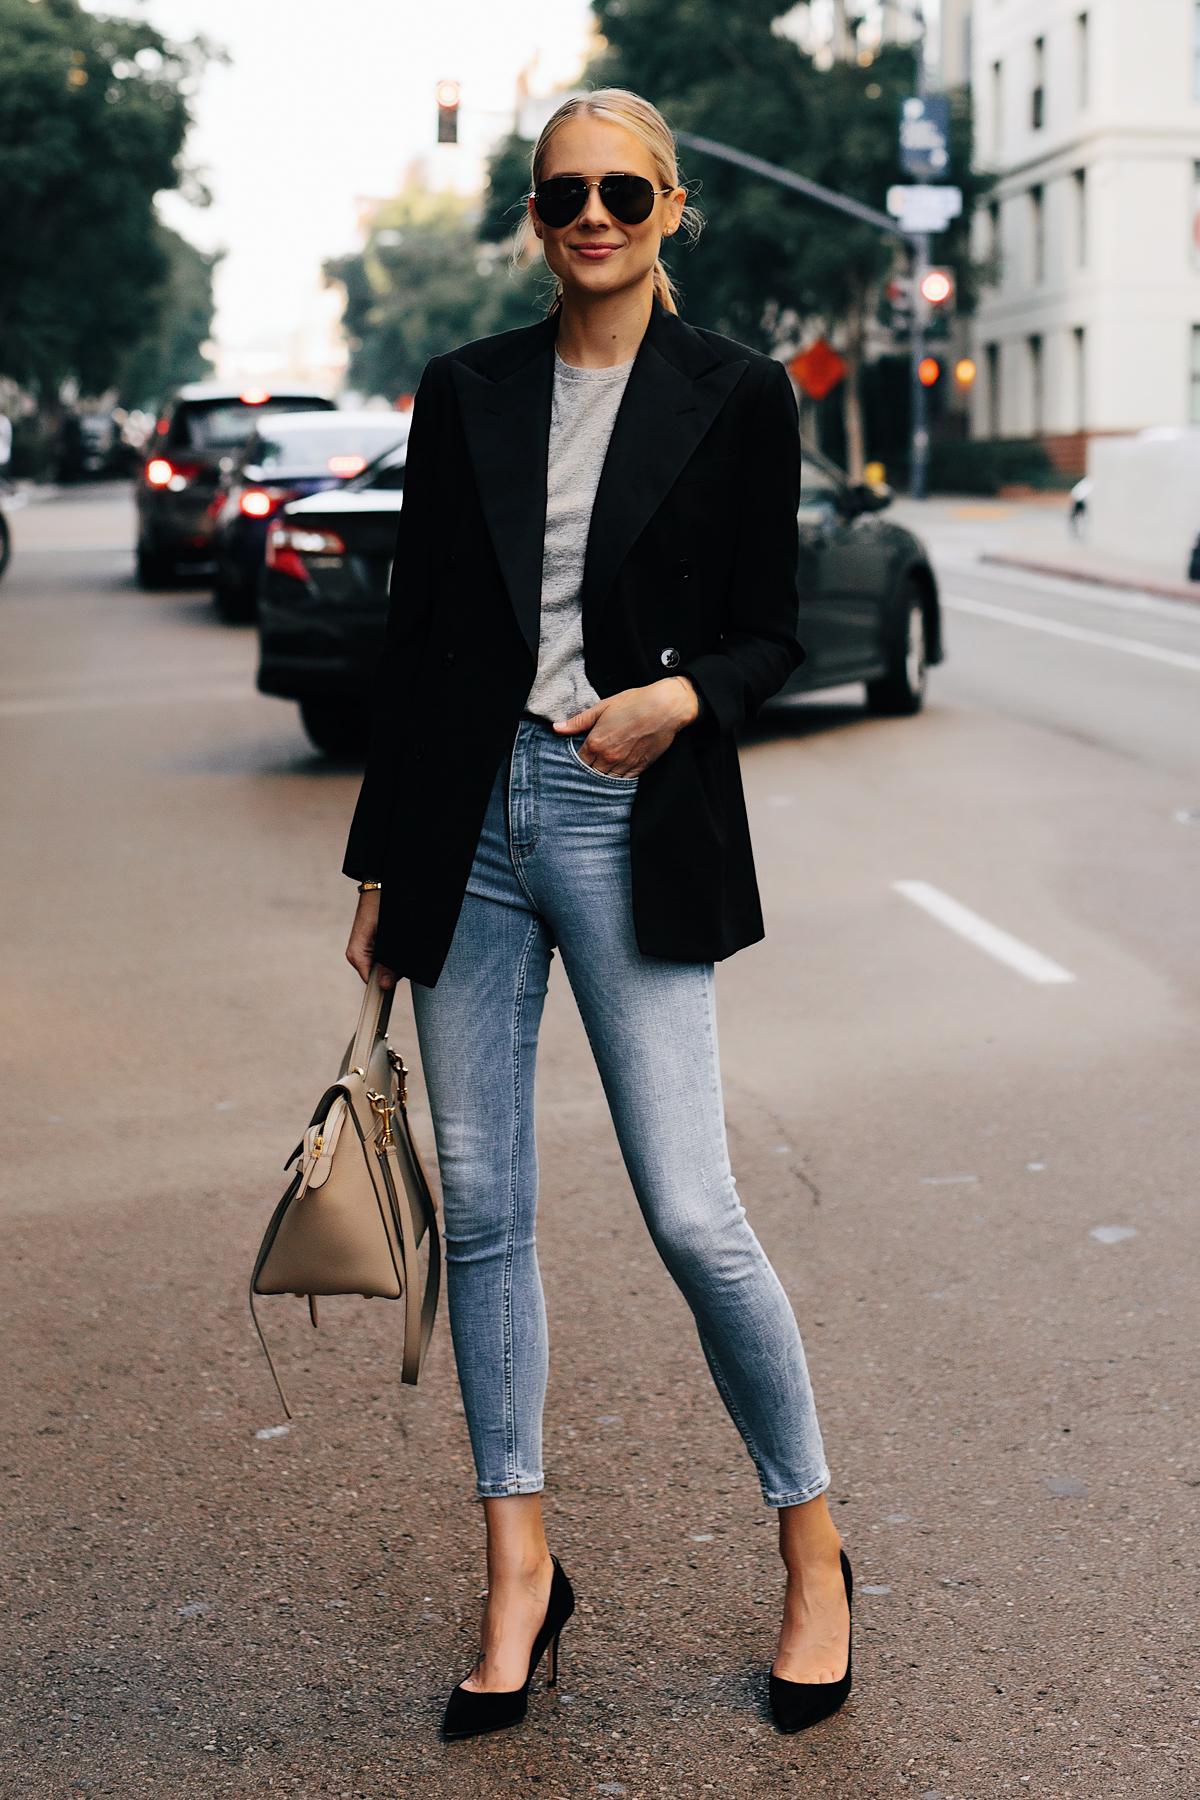 Blonde Woman Wearing Ralph Lauren Polo Black Blazer Grey Tshirt Denim Skinny Jeans Black Heels Outfit Fashion Jackson San Diego Fashion Blogger Street Style